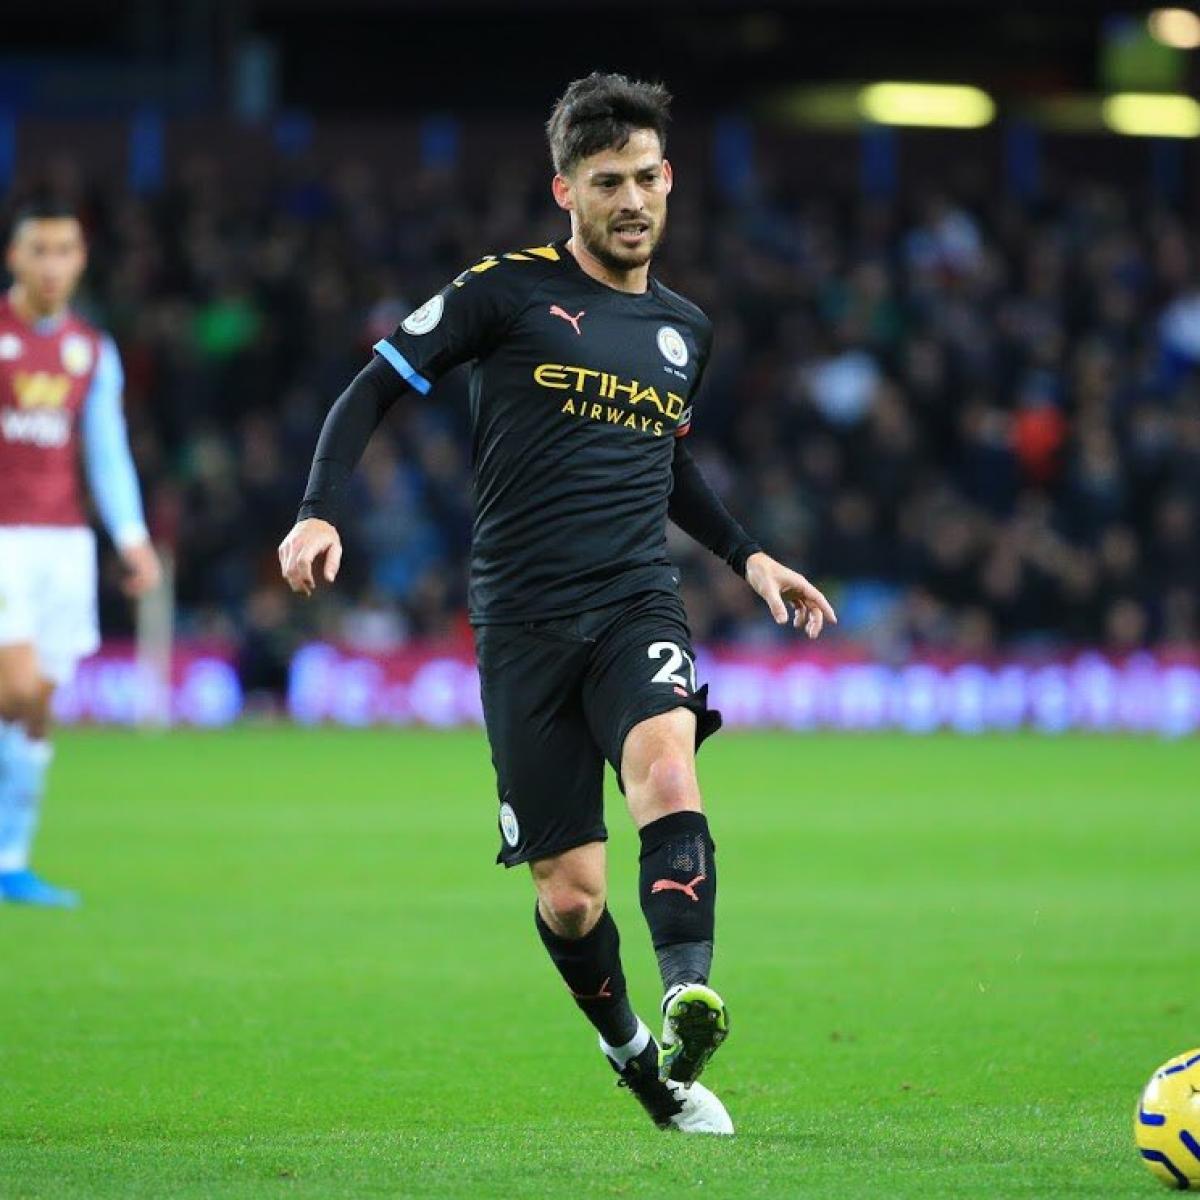 'Incredible person': Man City's David Silva picks his best Premier League player